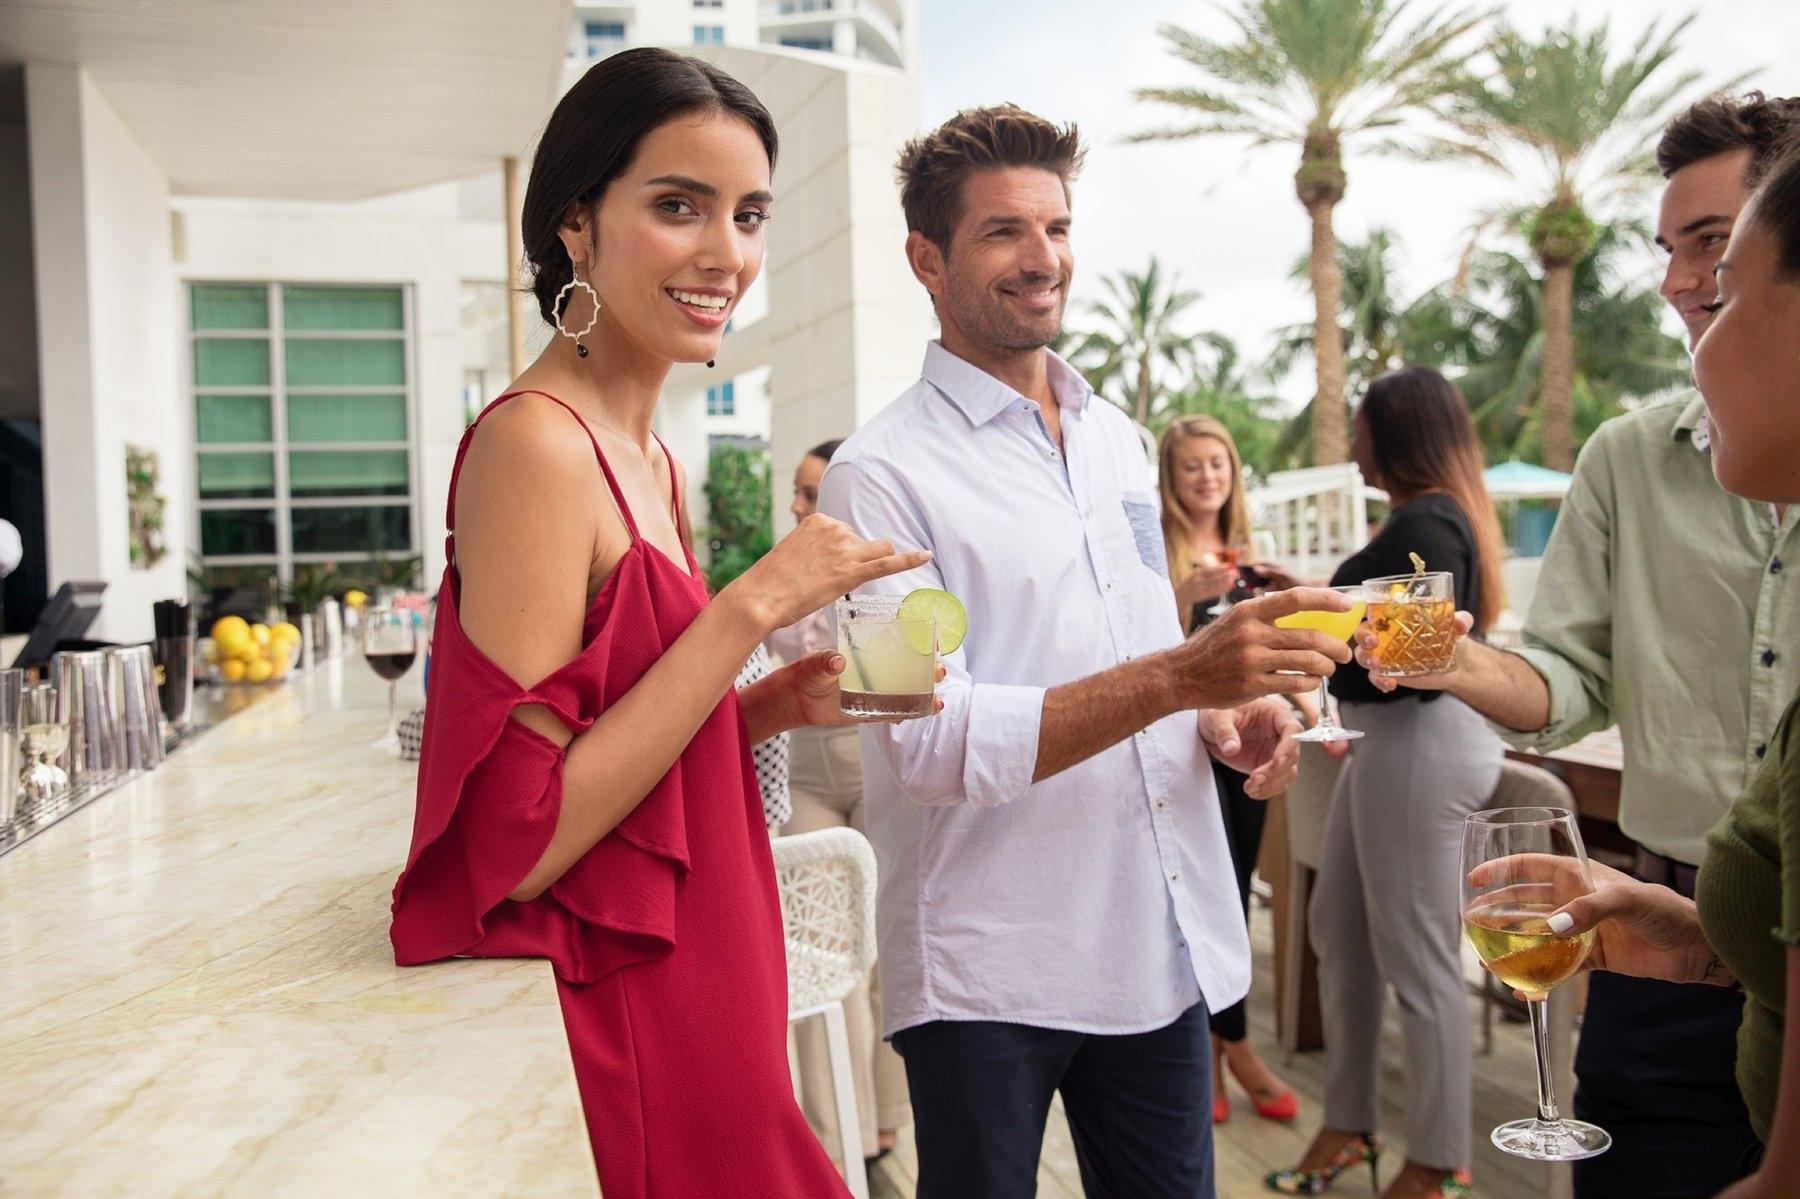 Gathering at Hotel Bar - The Diplomat Beach Resort, South FL